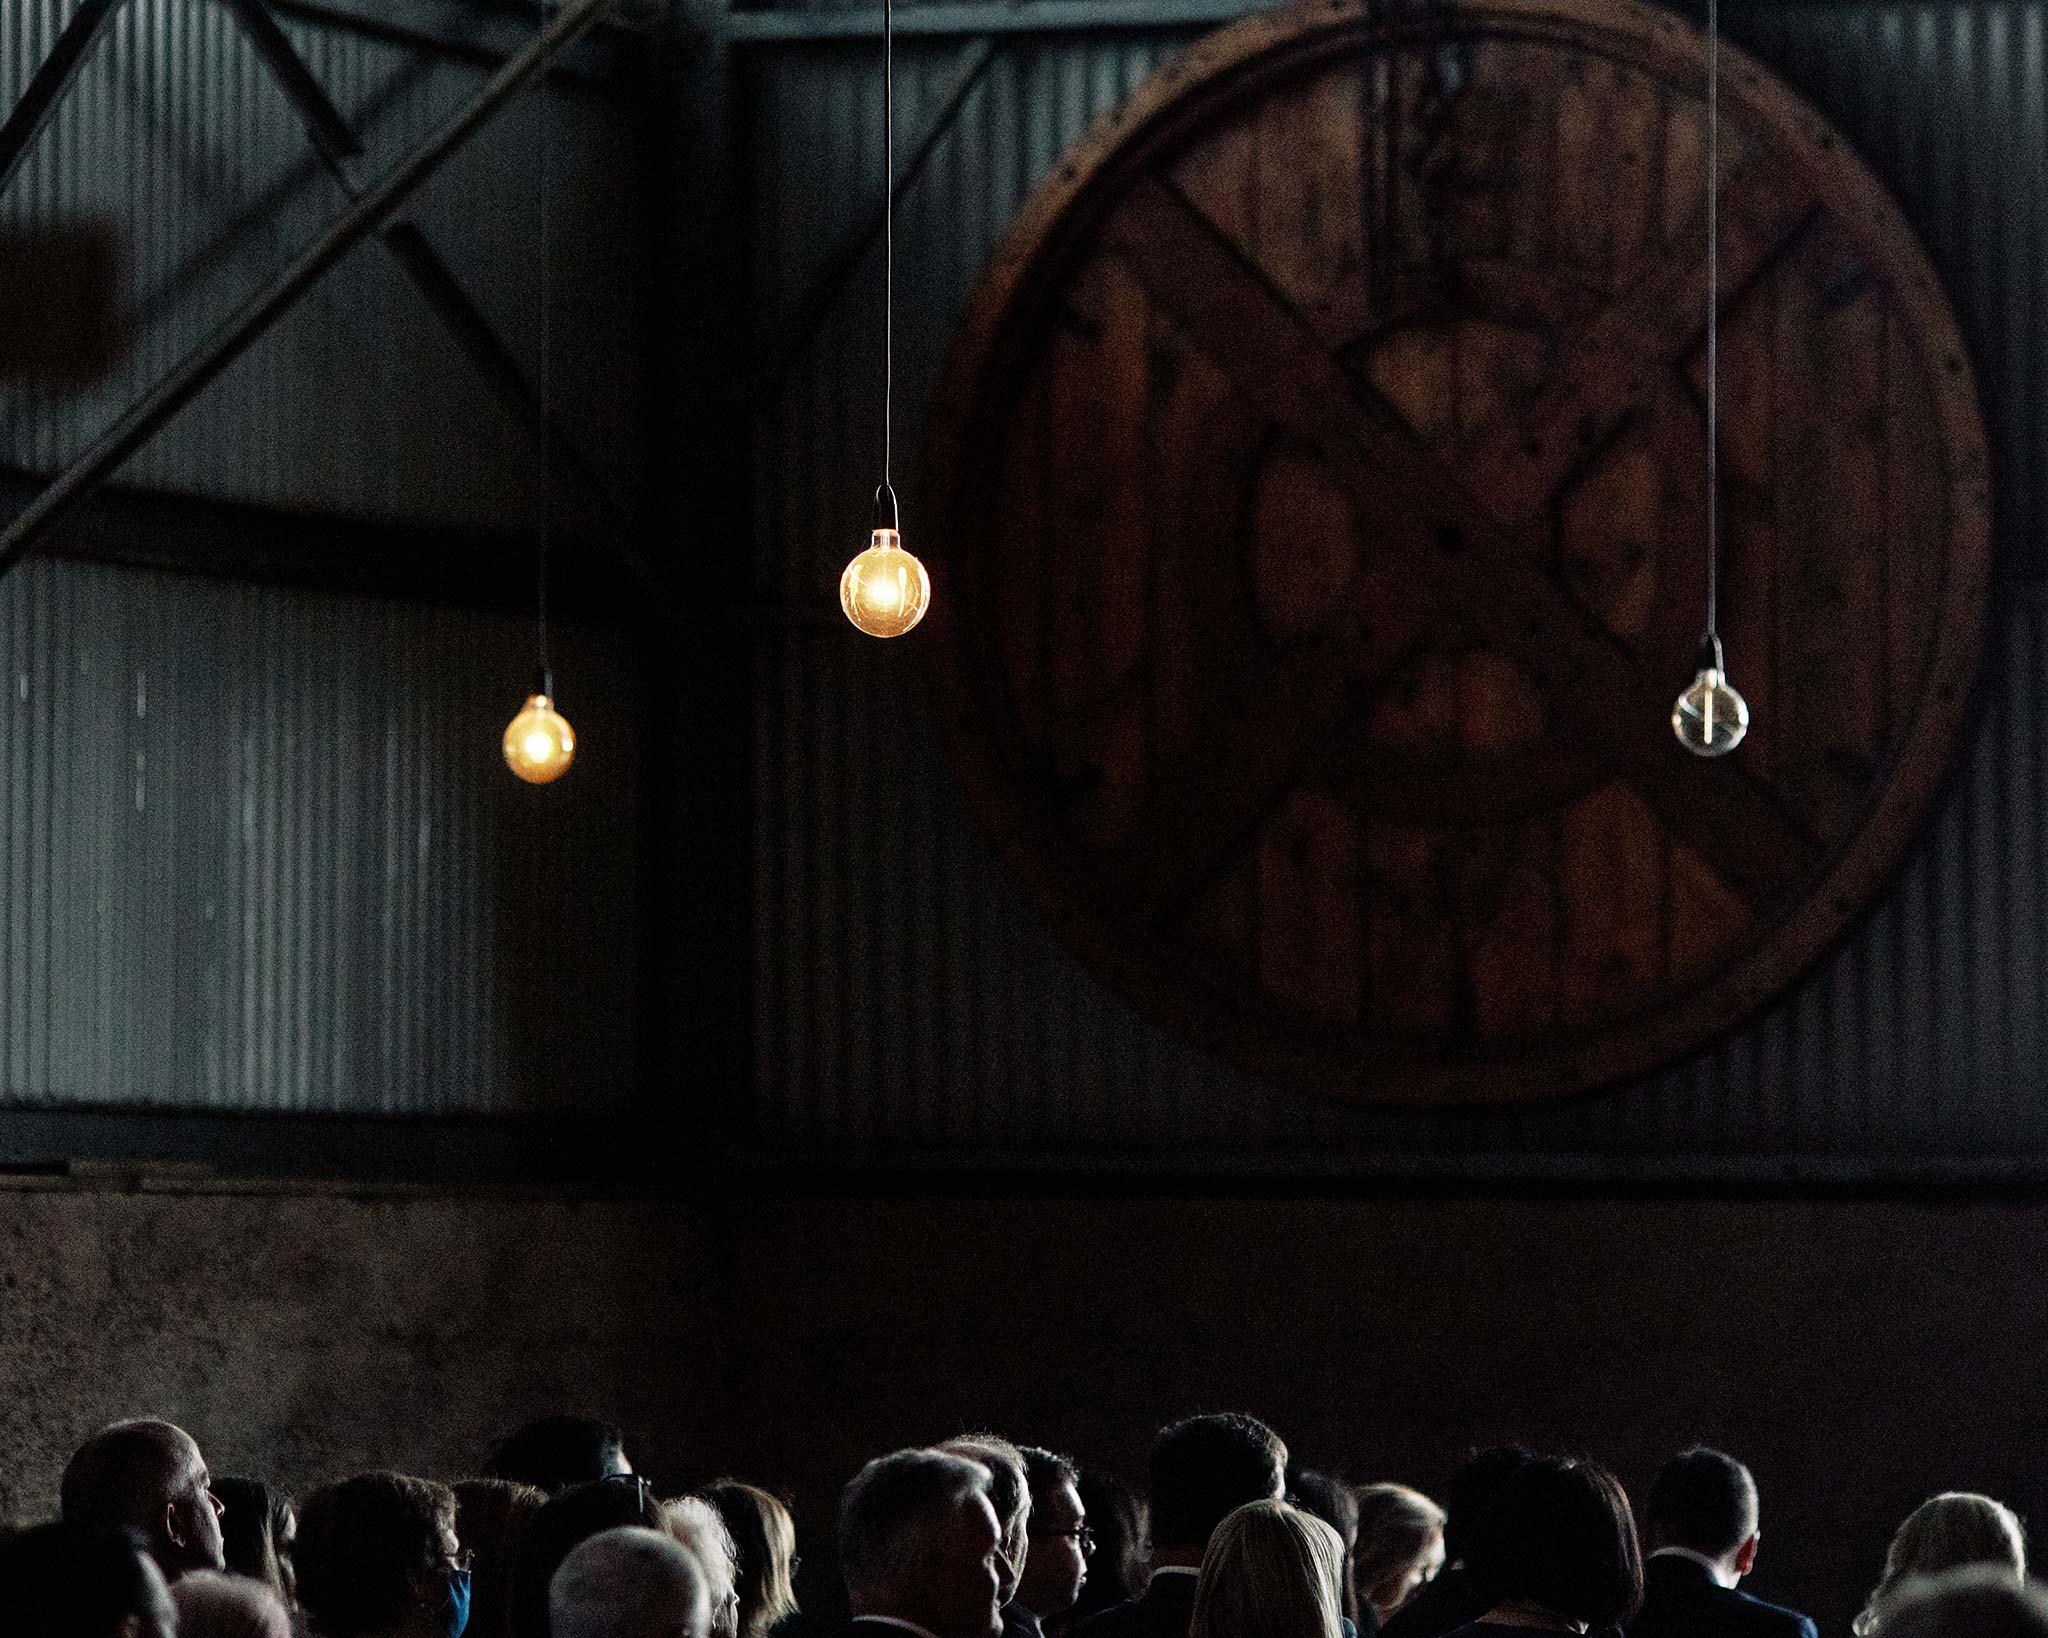 Zonzo estate wedding barn lights